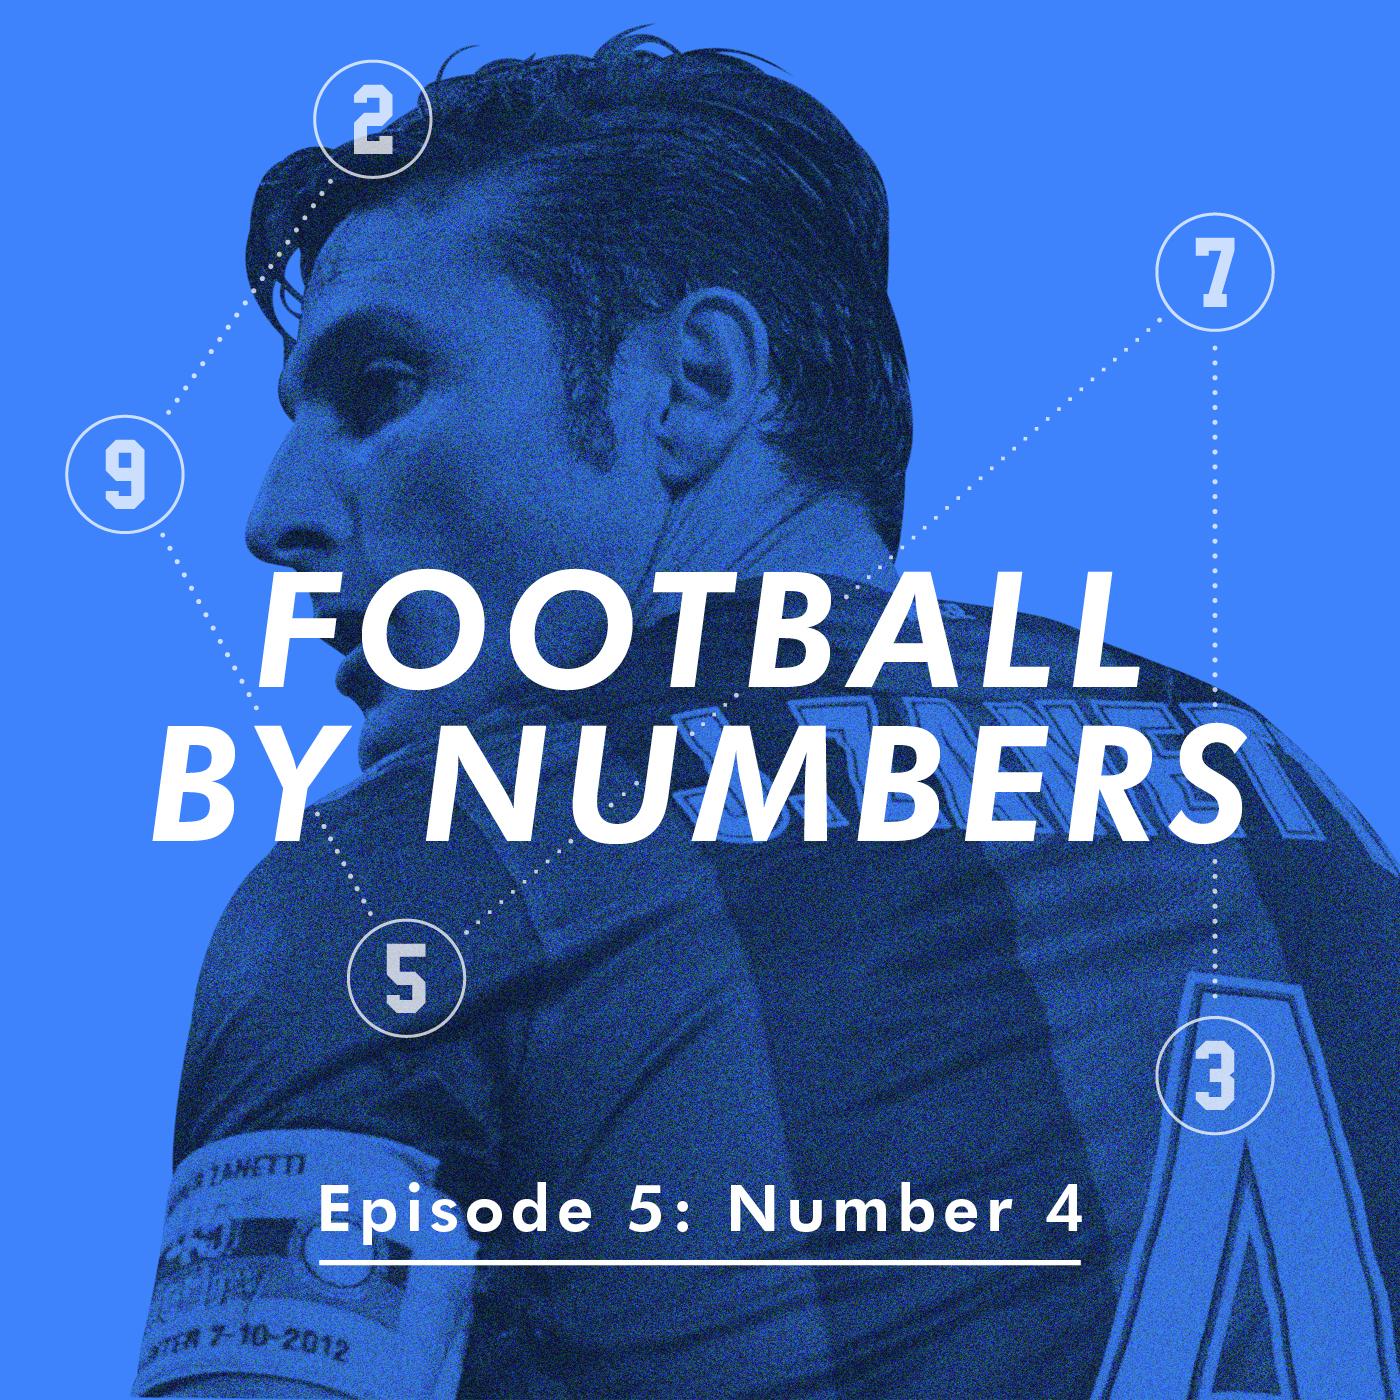 FootballByNumbers-Covers-E5.jpg